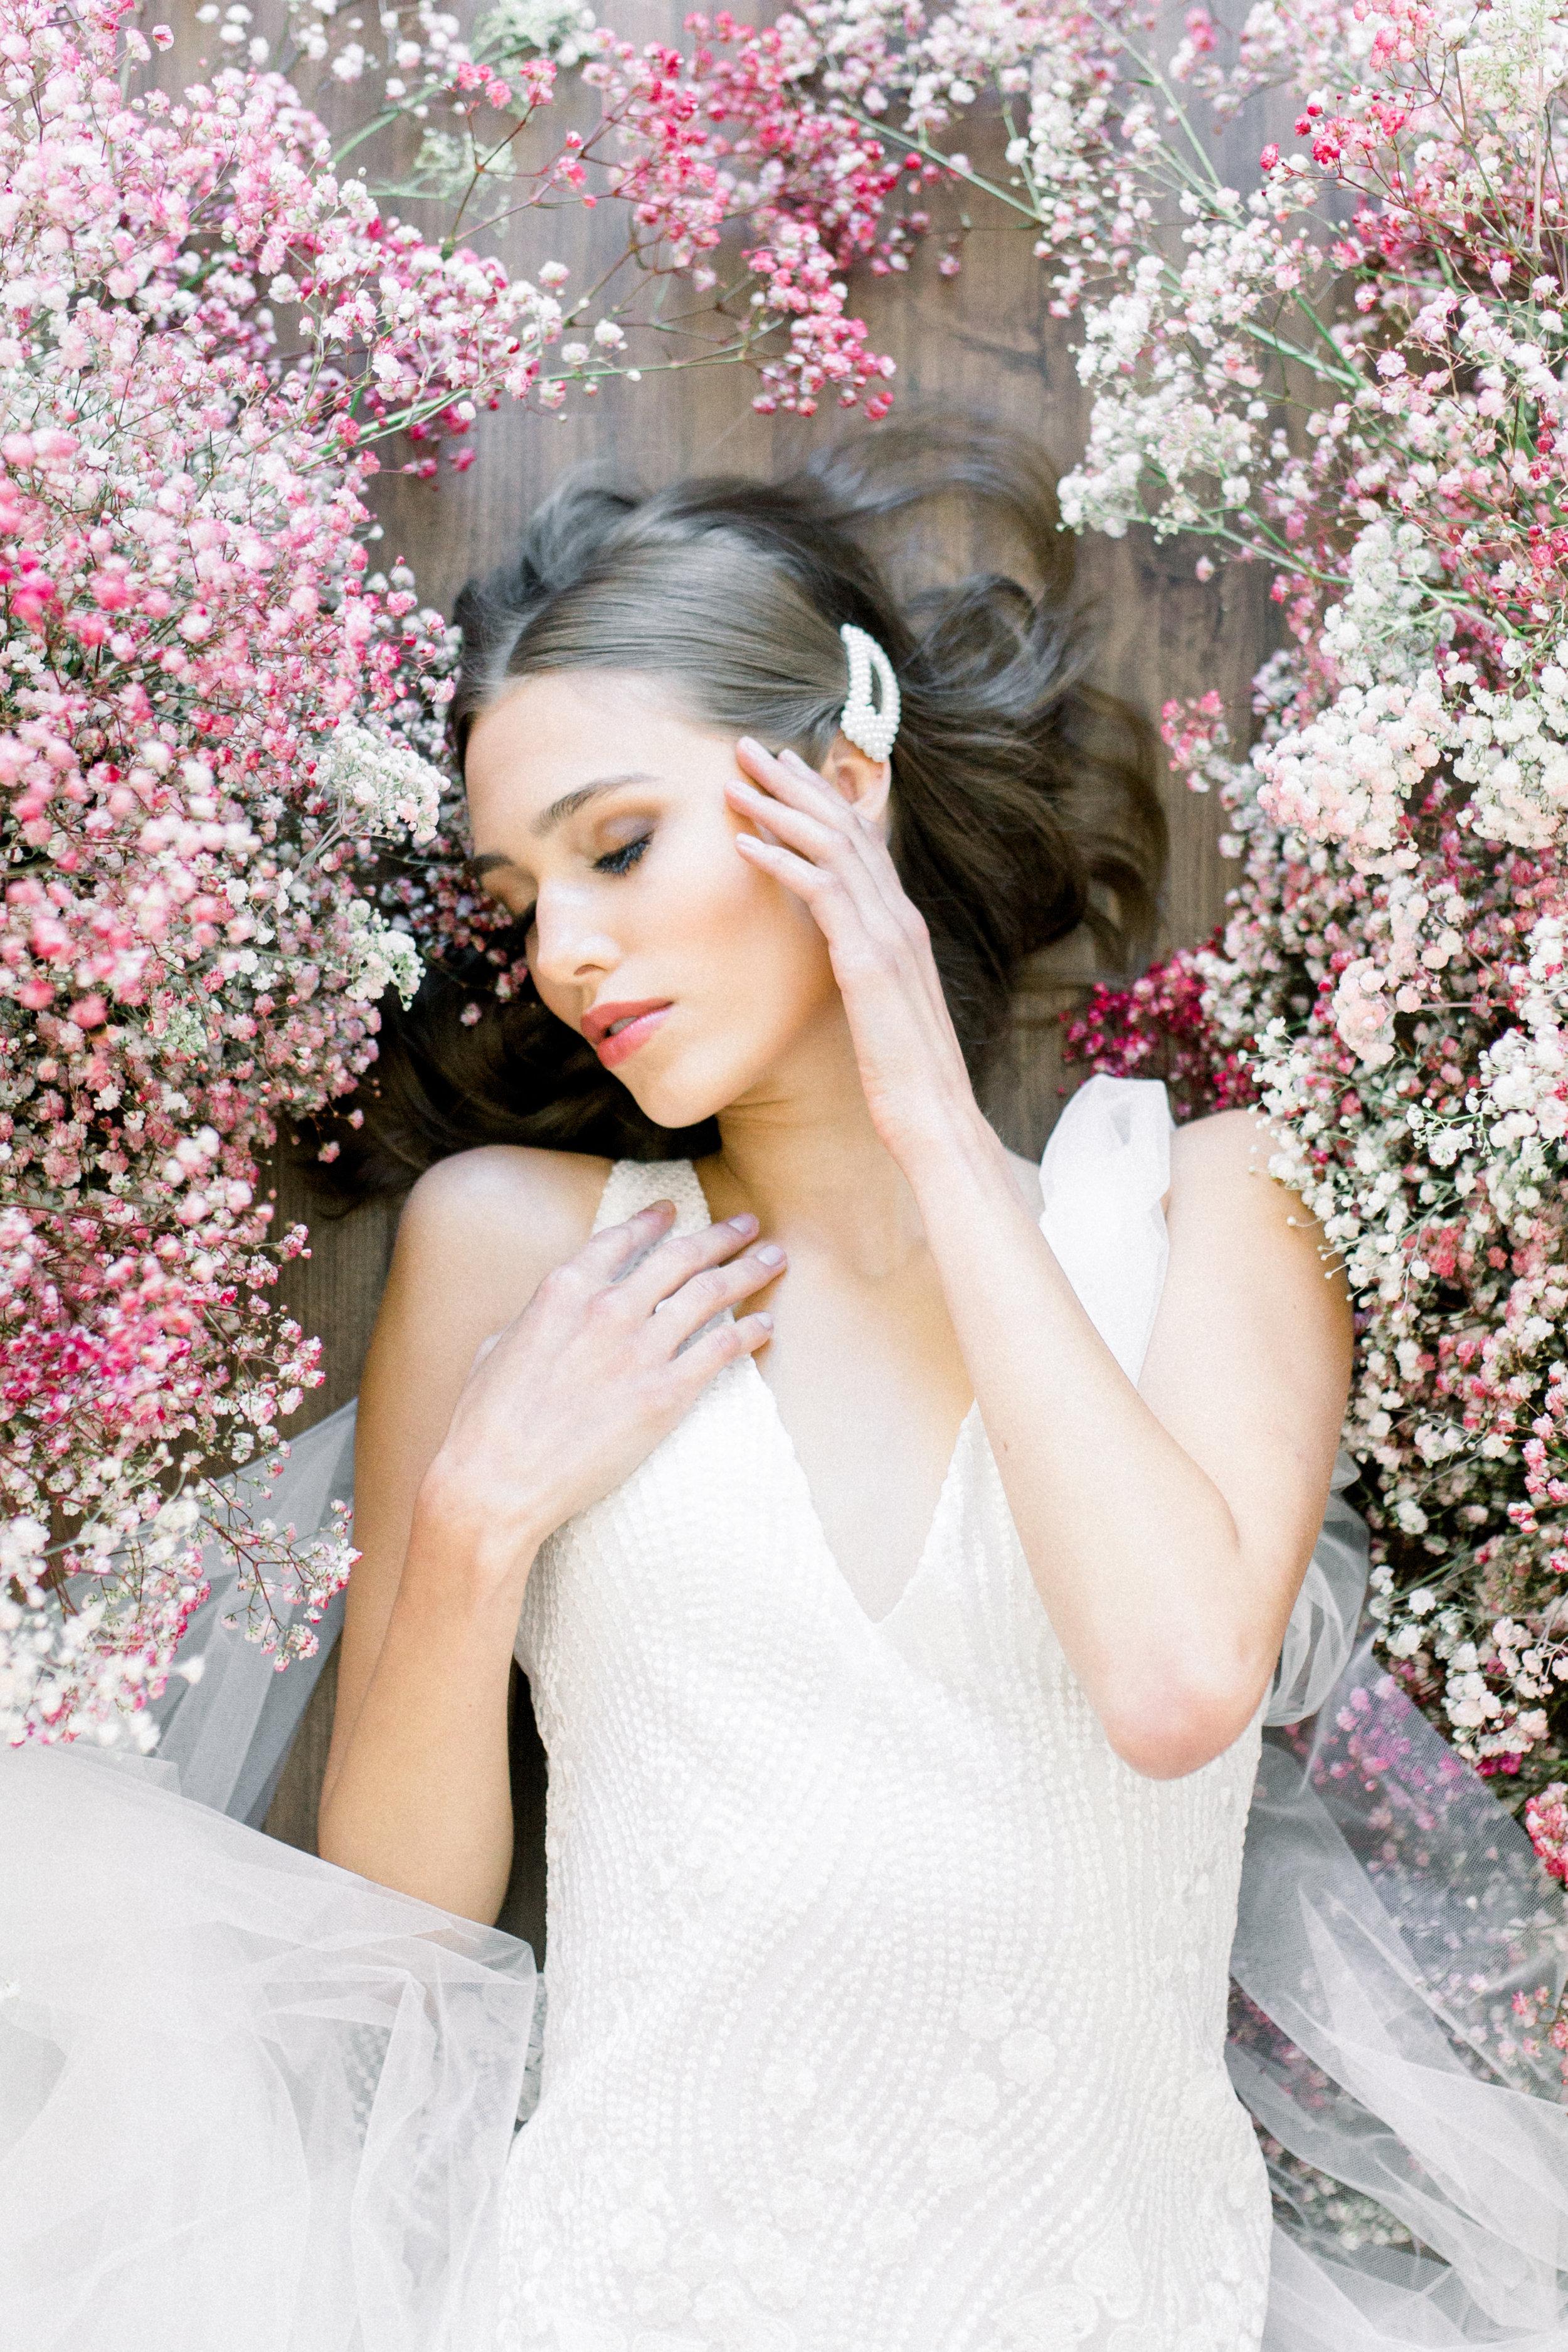 Bridal Gown Lookbook - Arizona florist Phoenix Scottsdale Sedona - Pink Ombre Babies Breath